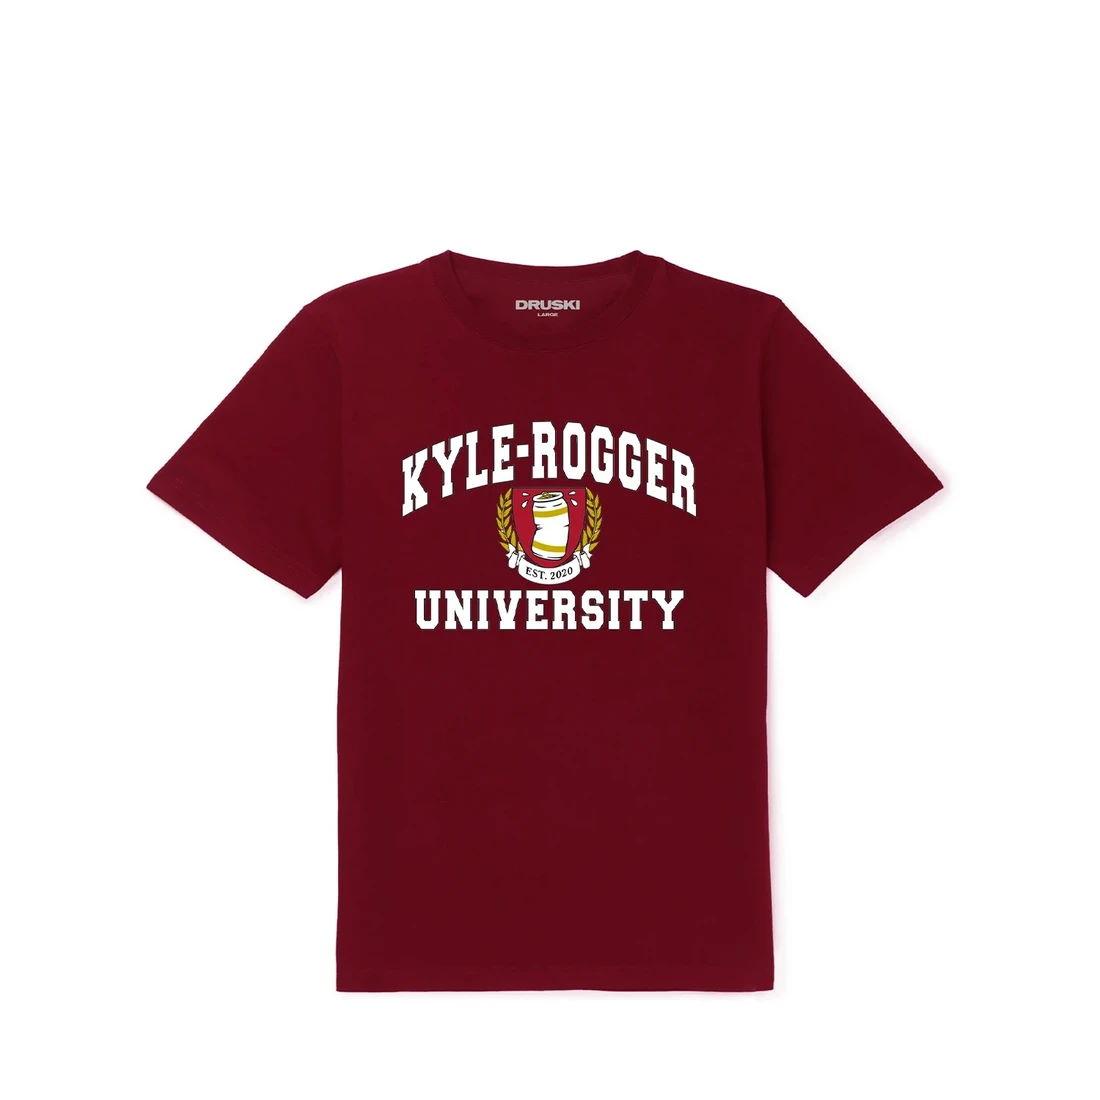 Kyle-Rogger Uni Tee - Burgundy